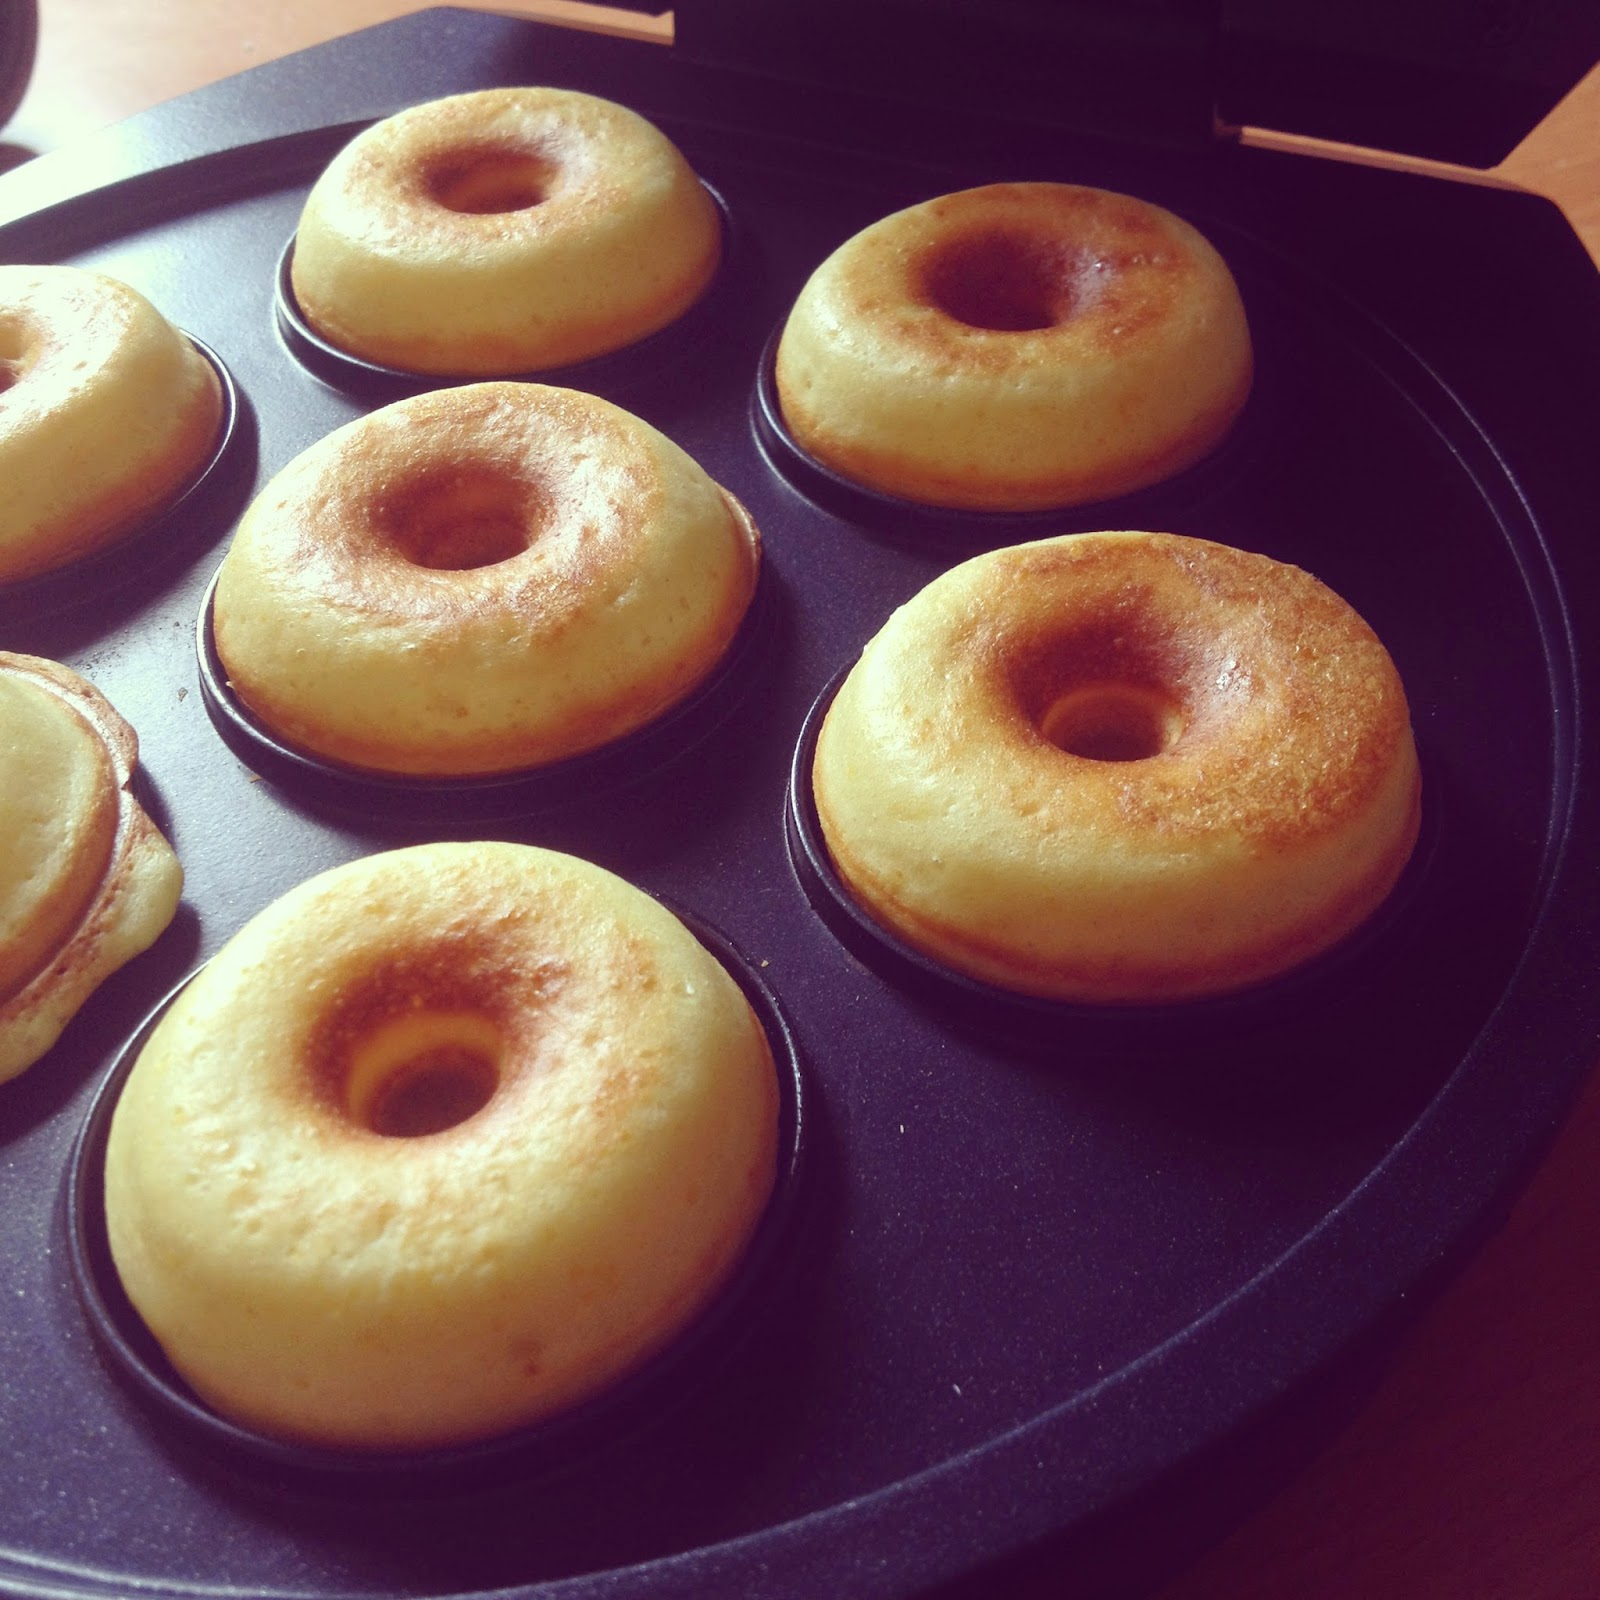 selma kitchen recette de donuts donuts en machine machine. Black Bedroom Furniture Sets. Home Design Ideas